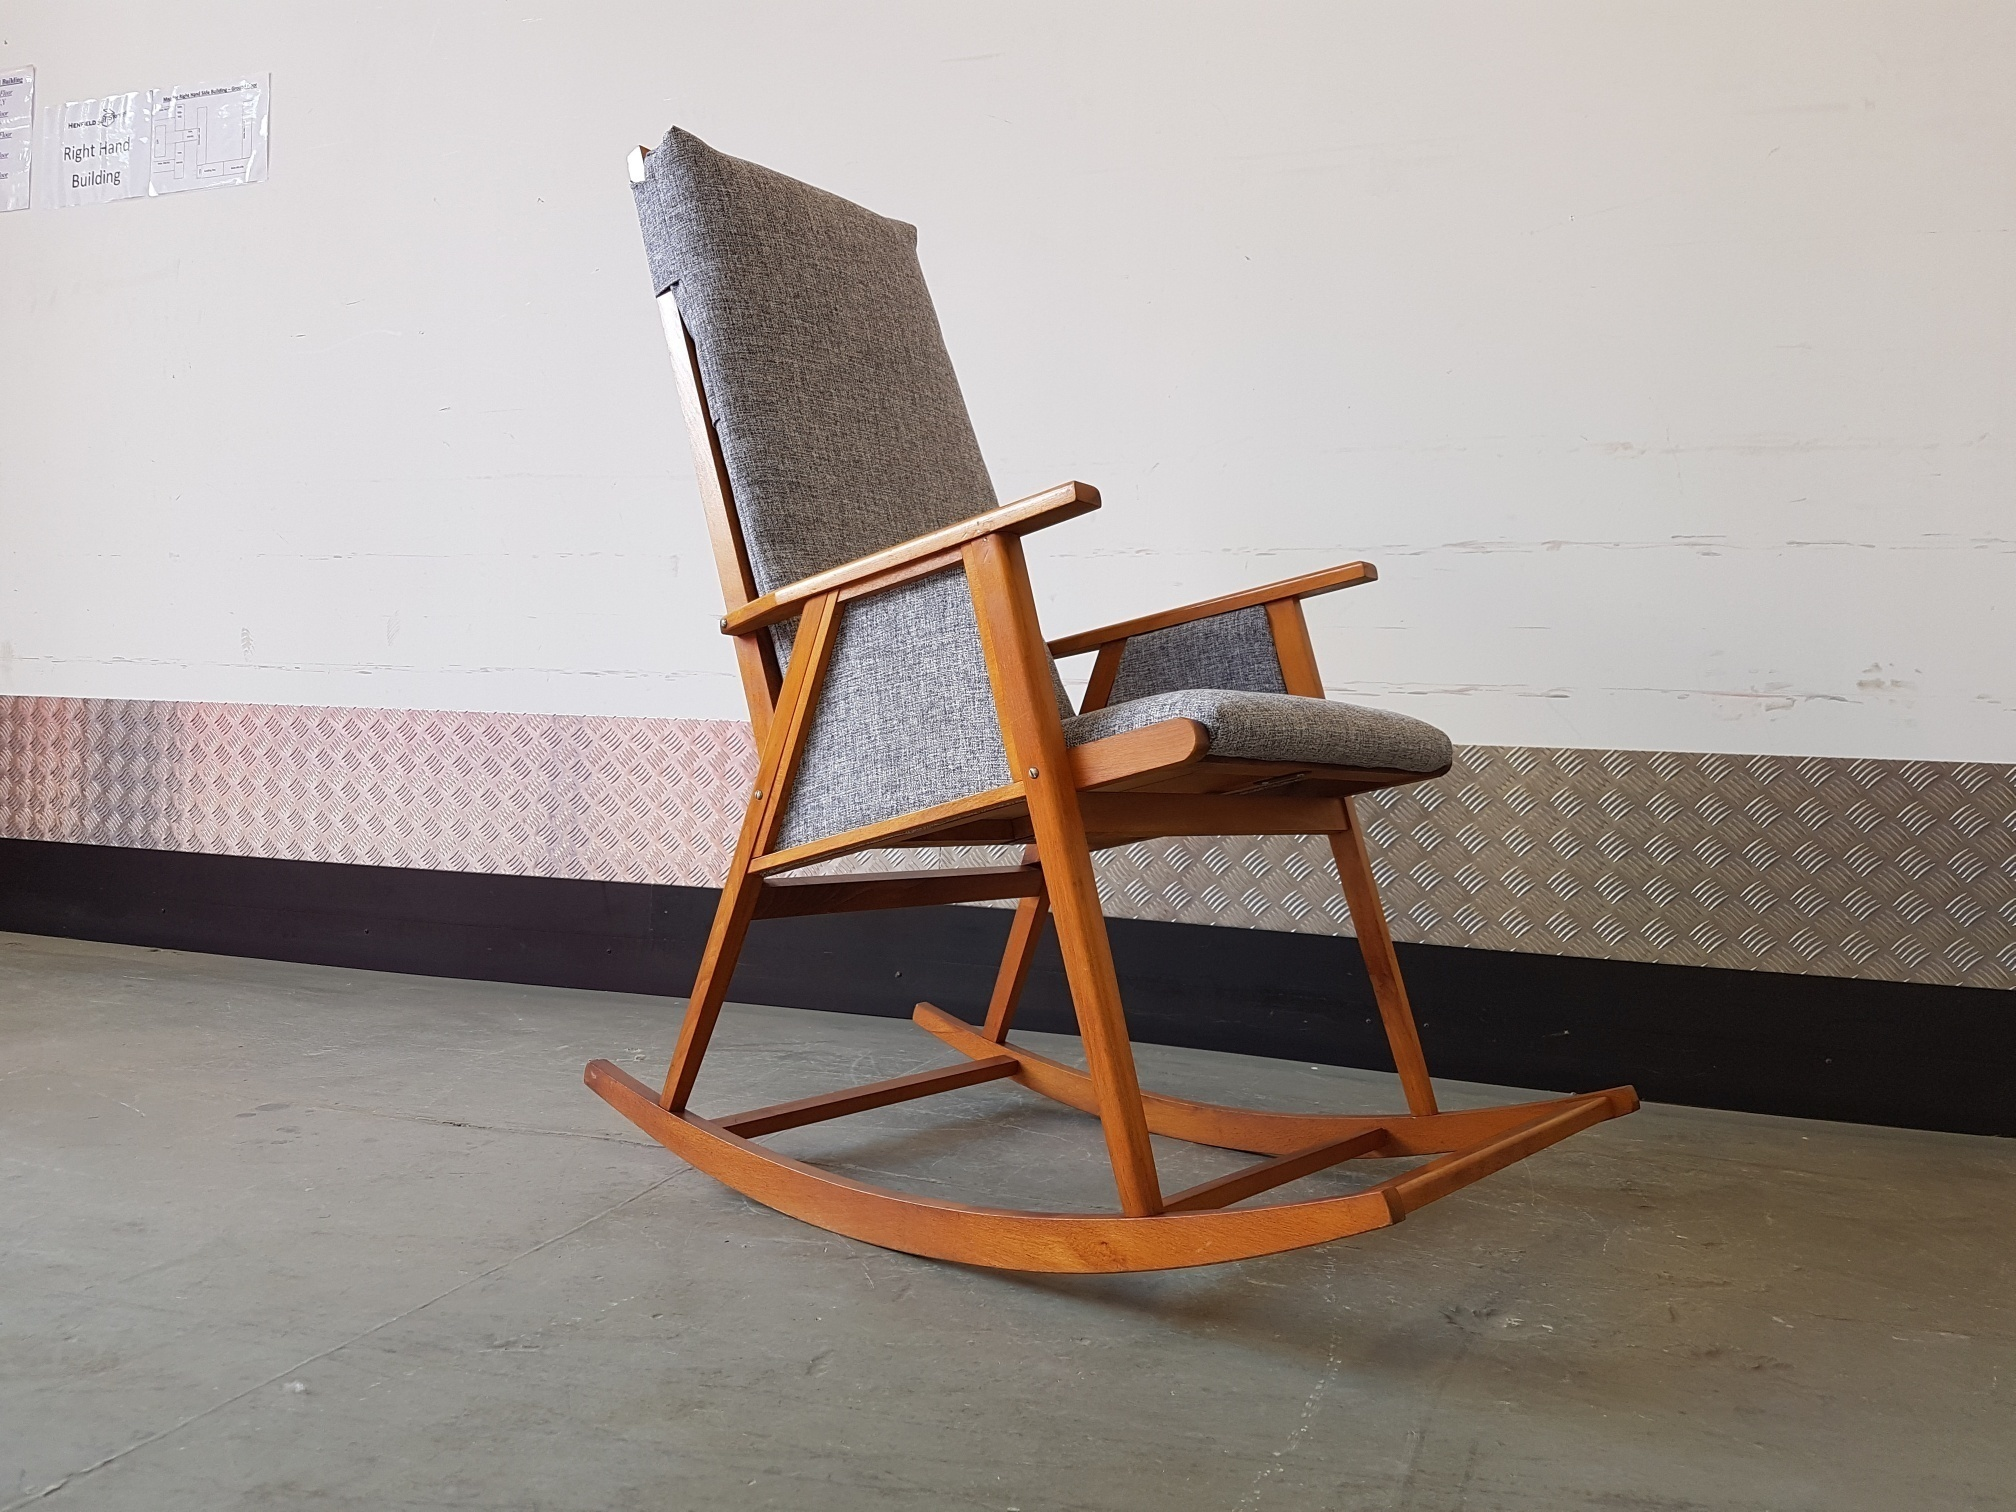 Brilliant Rocking Chair Mid Century Modern Inzonedesignstudio Interior Chair Design Inzonedesignstudiocom